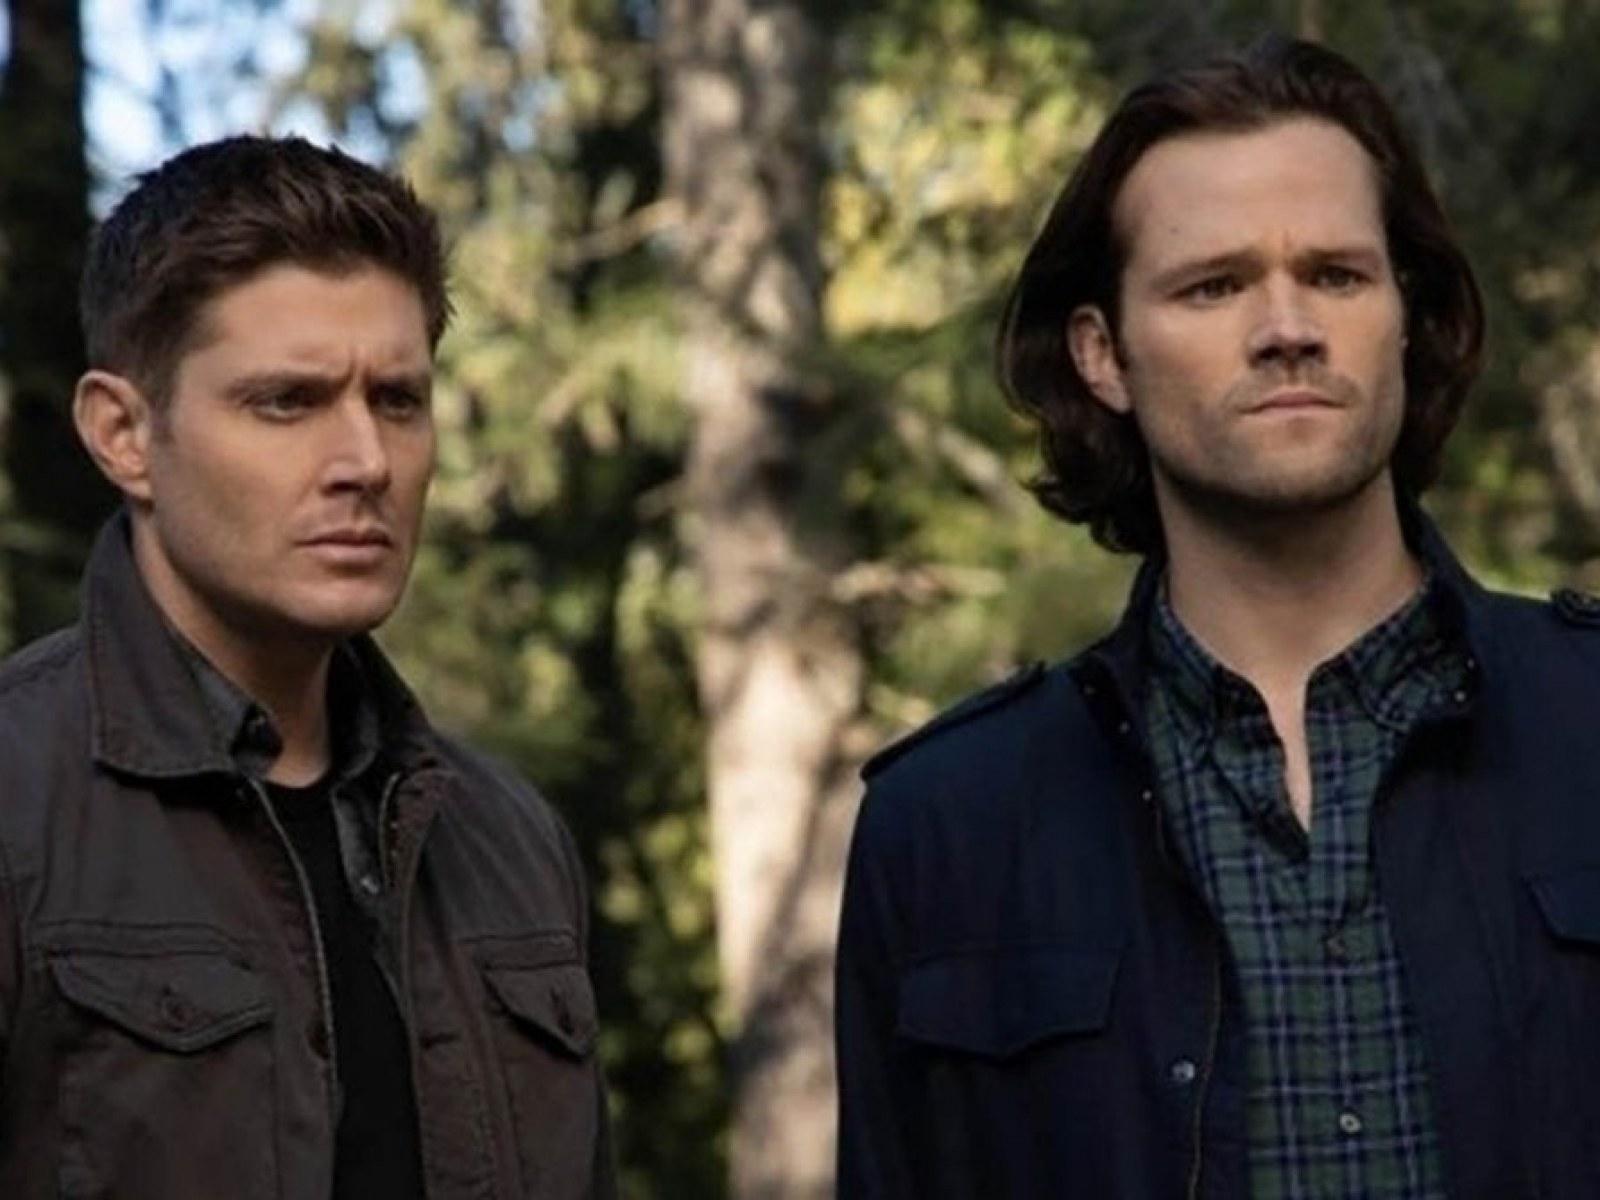 Supernatural' Series Finale Release Date, Cast, Trailer, Plot